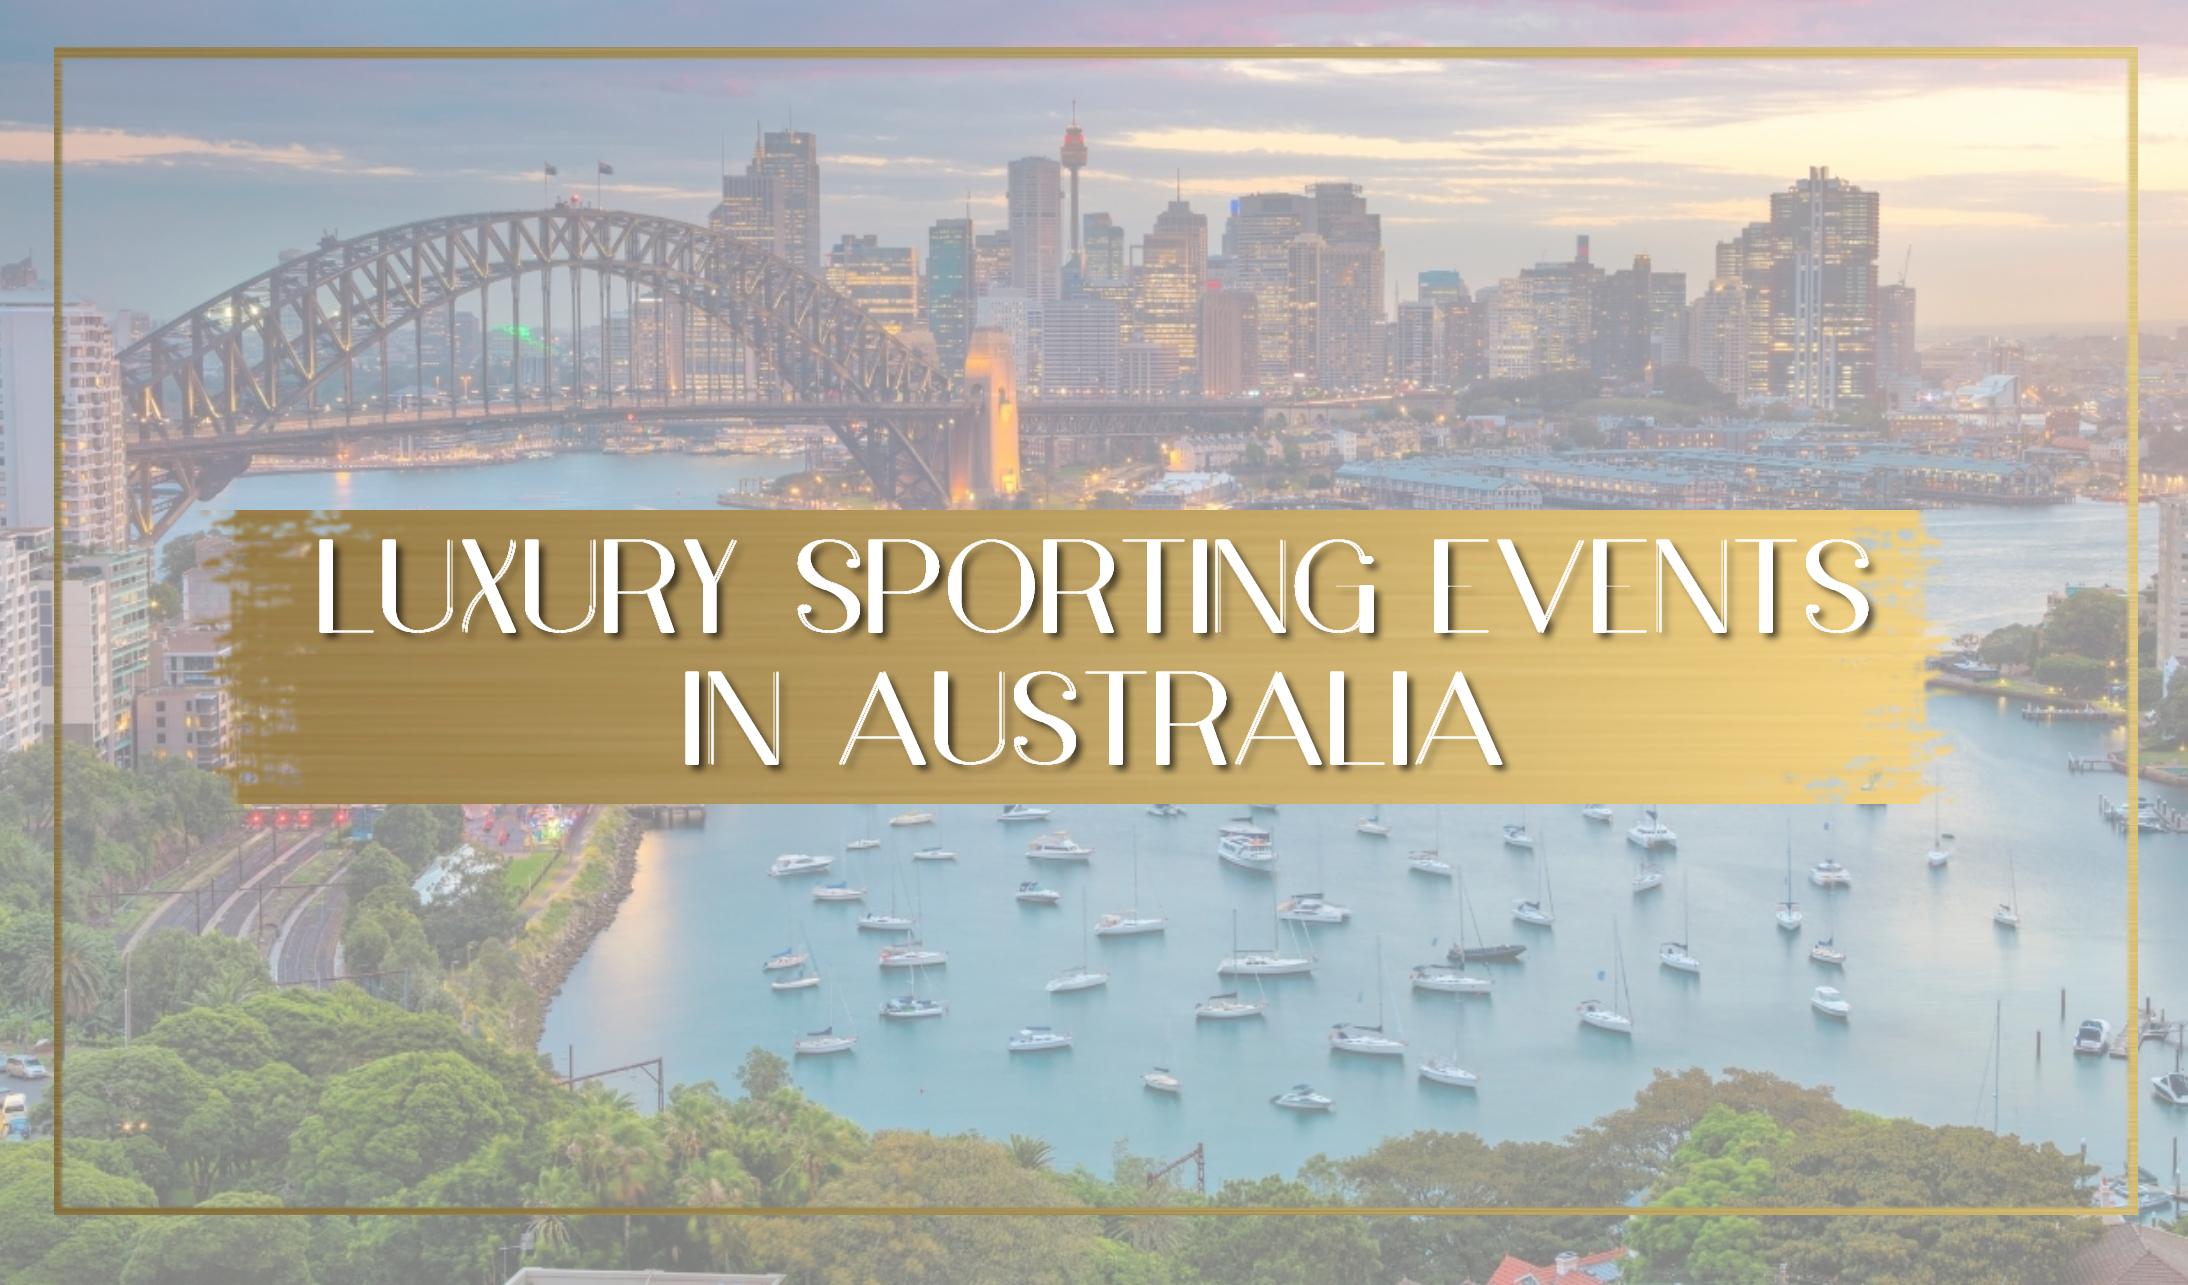 Luxury sporting events in Australia main